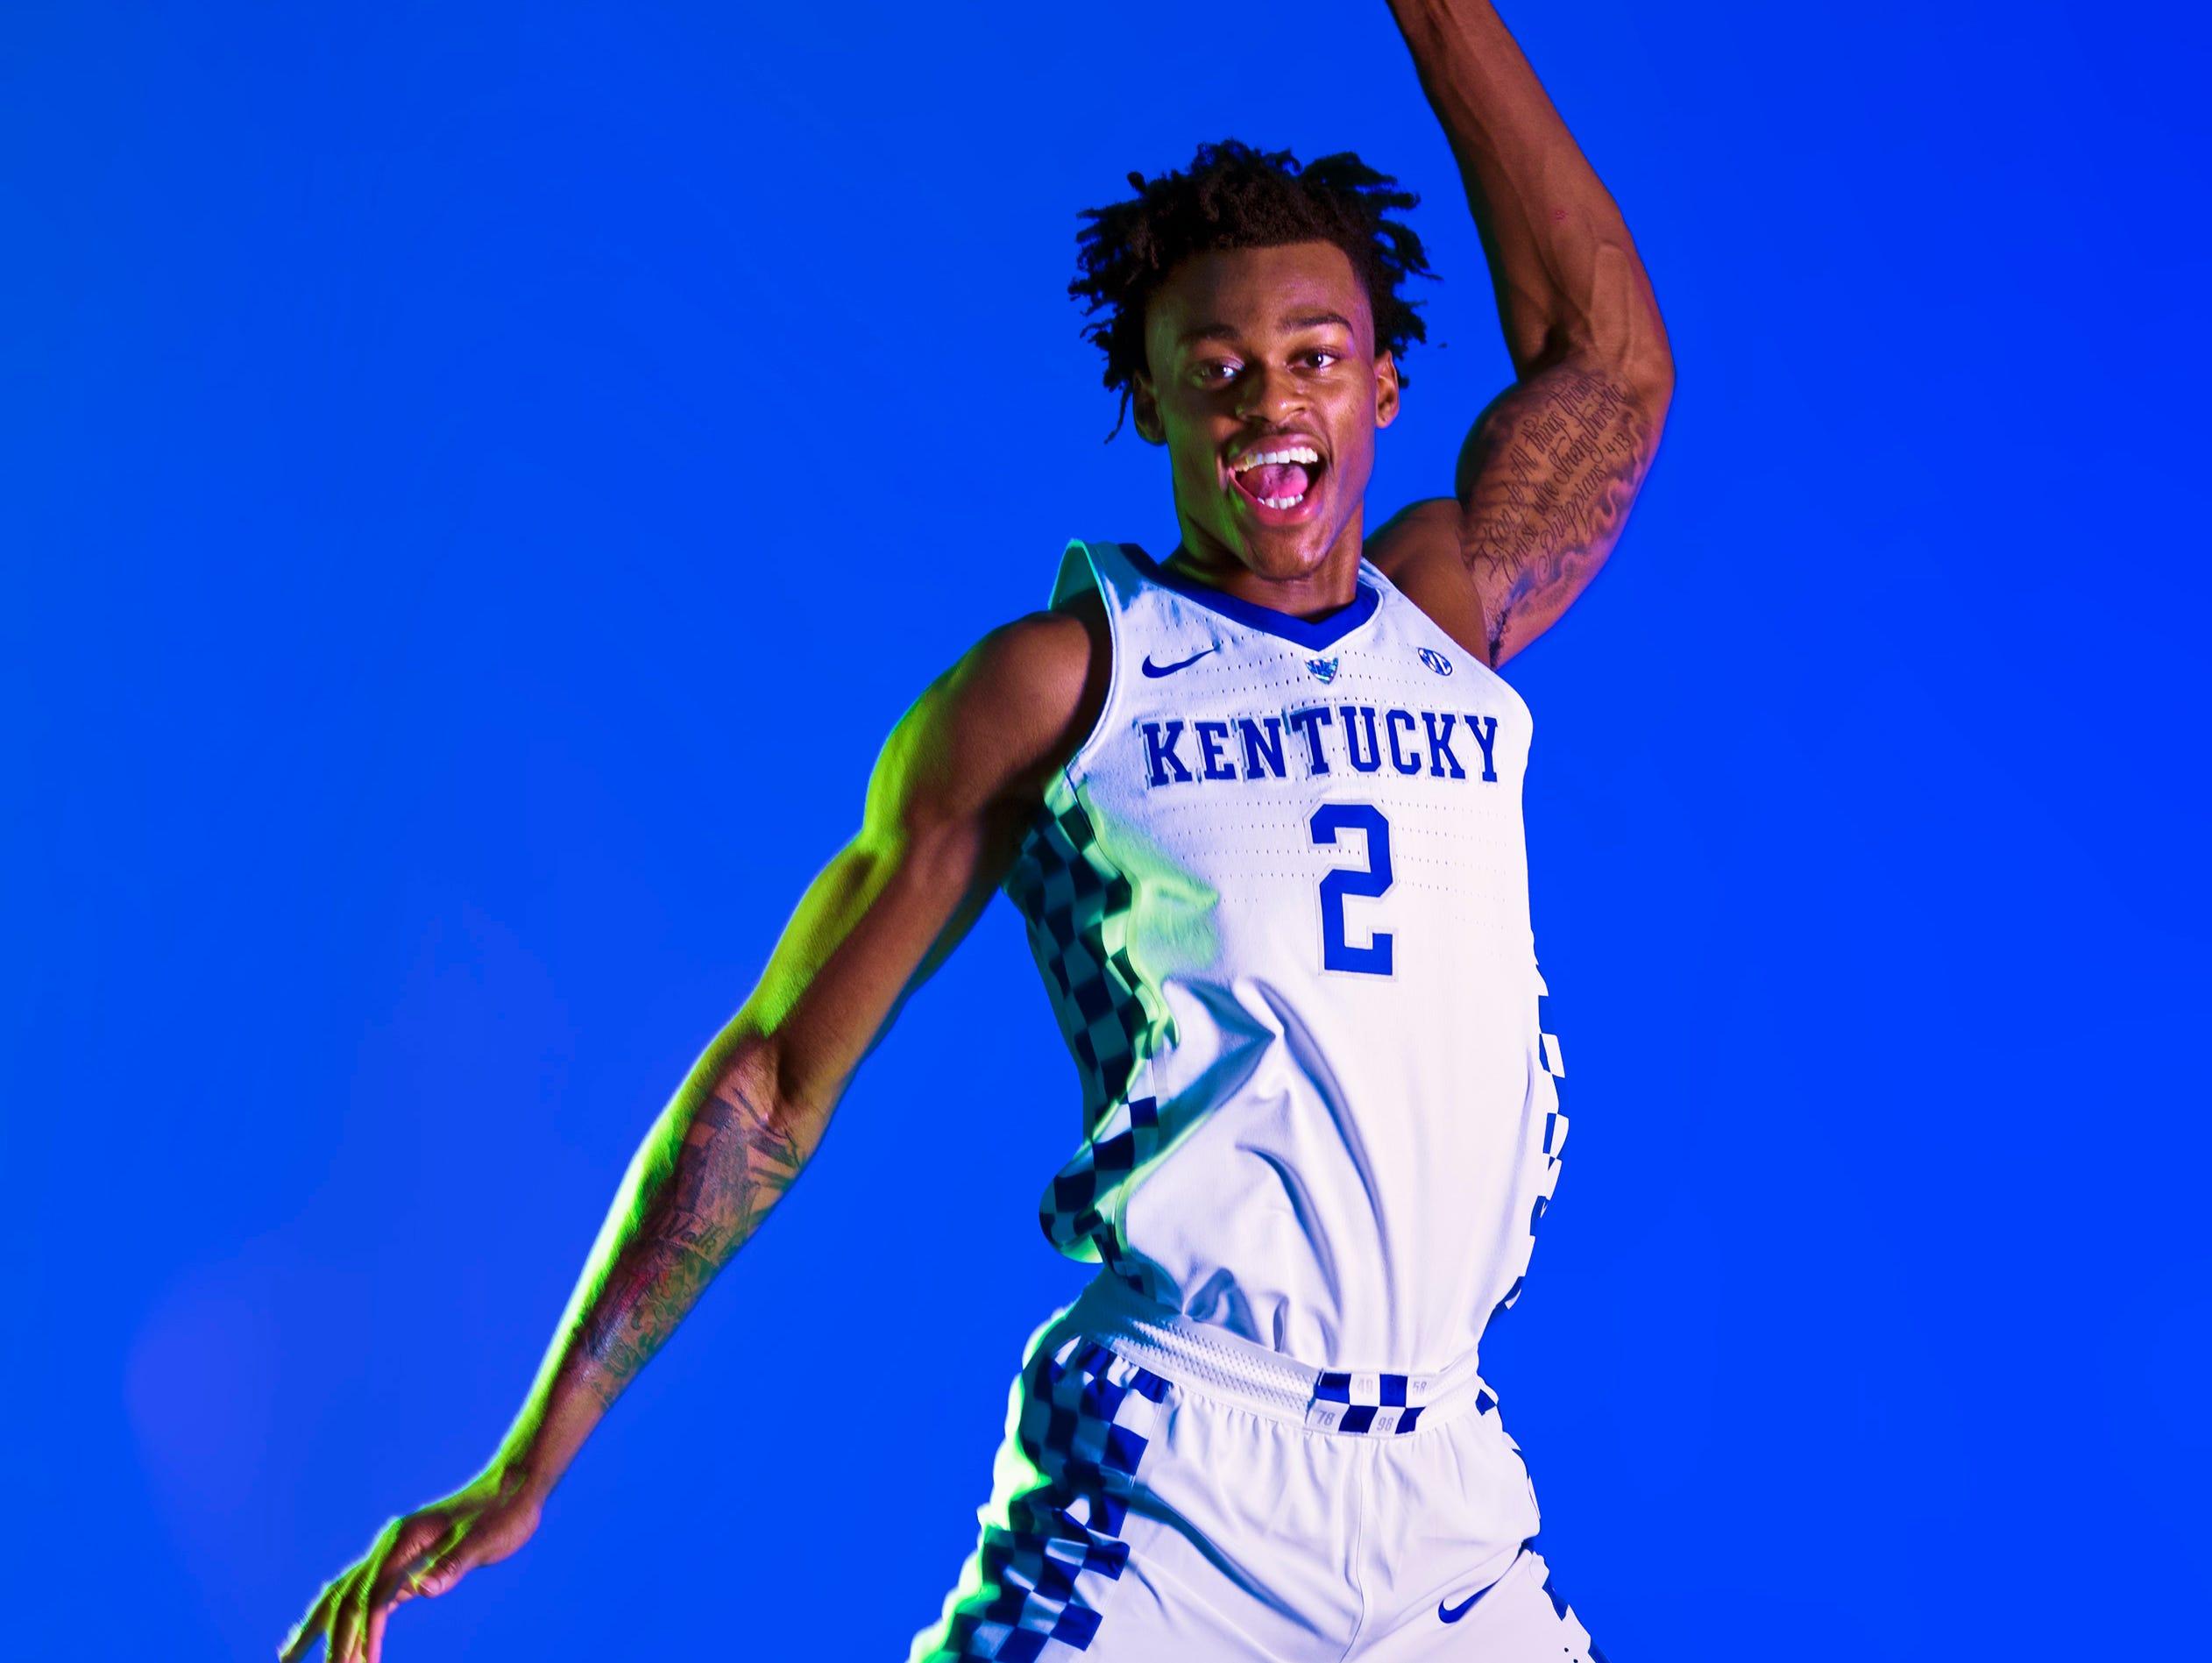 Kentucky Basketball 2017 18 Season Preview For The Wildcats: John Calipari 'didn't Know' Jarred Vanderbilt's Status, So